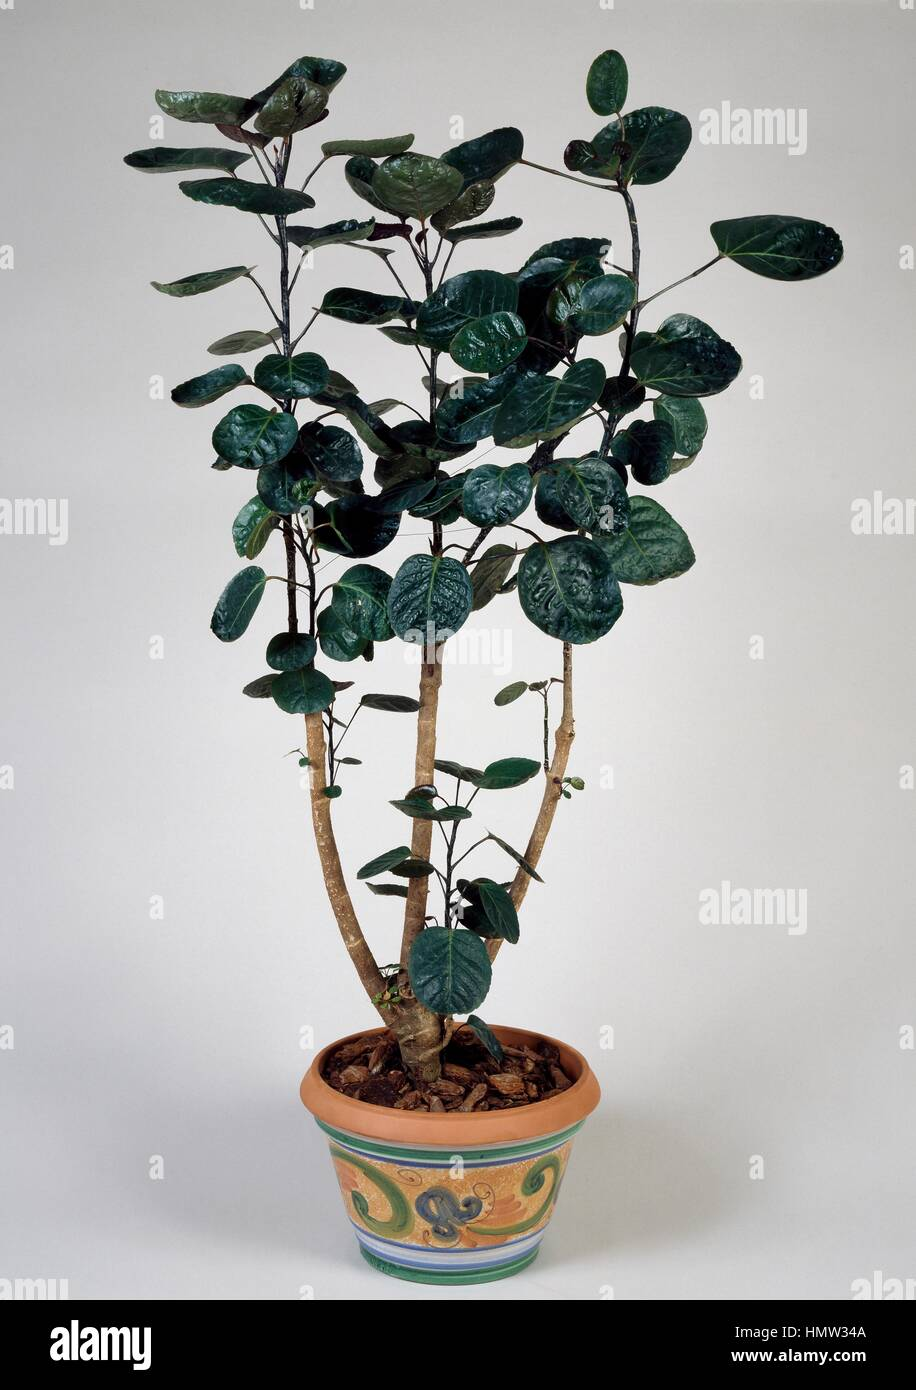 Fabian aralia (Polyscias fabian), Araliaceae. - Stock Image